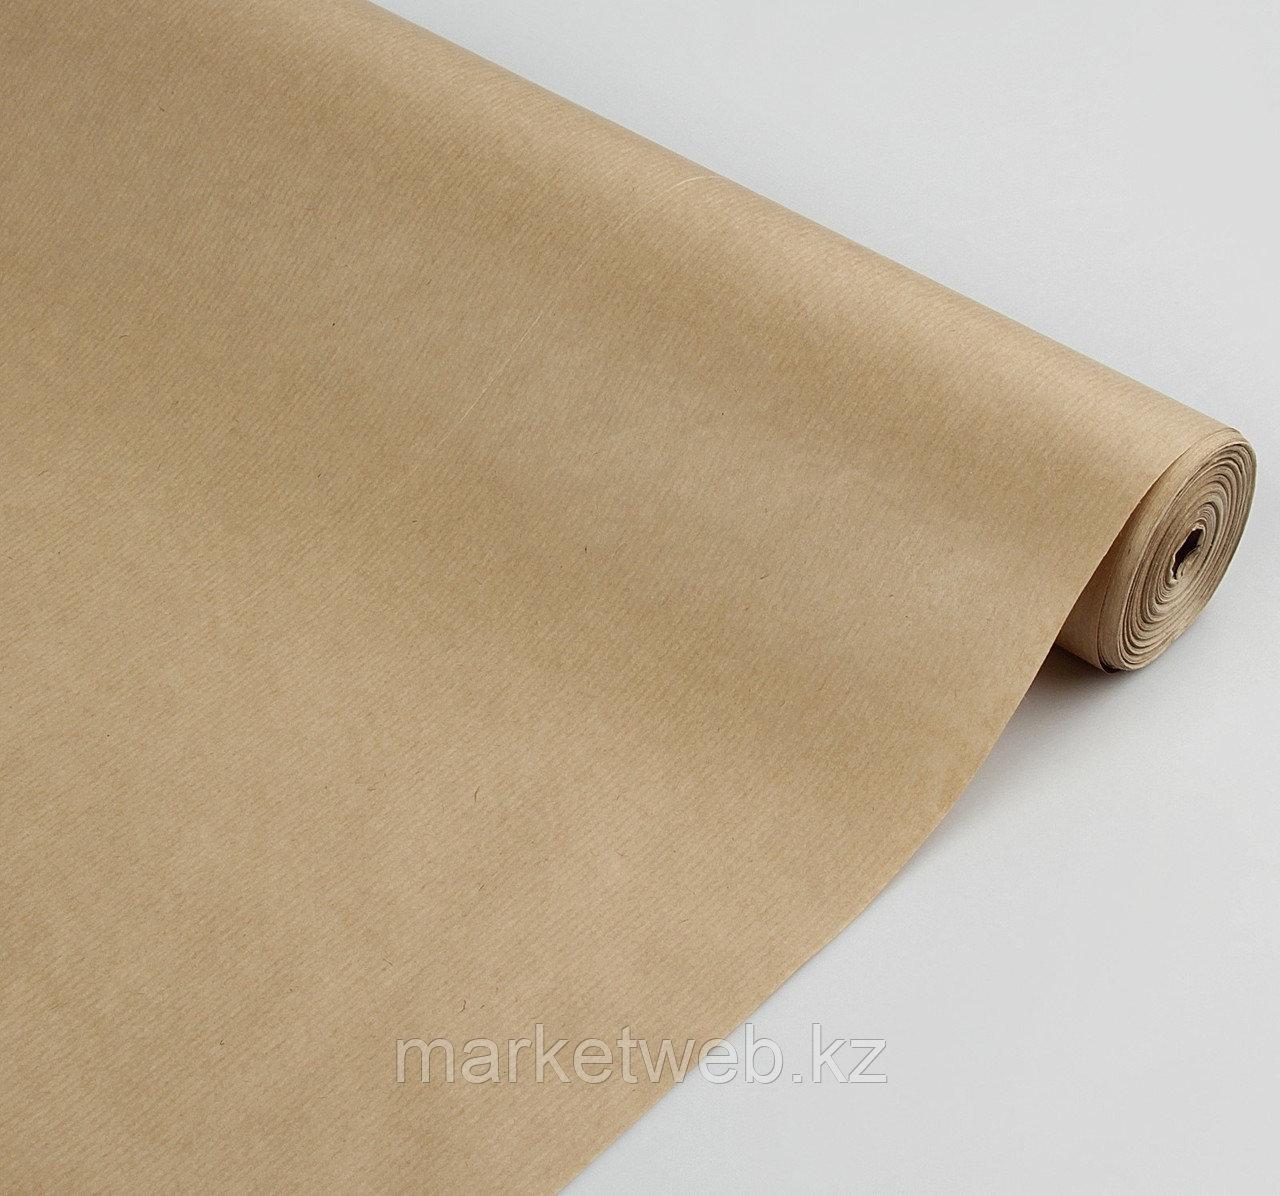 Бумага упаковочная крафт 0,72 x 50 м - фото 1